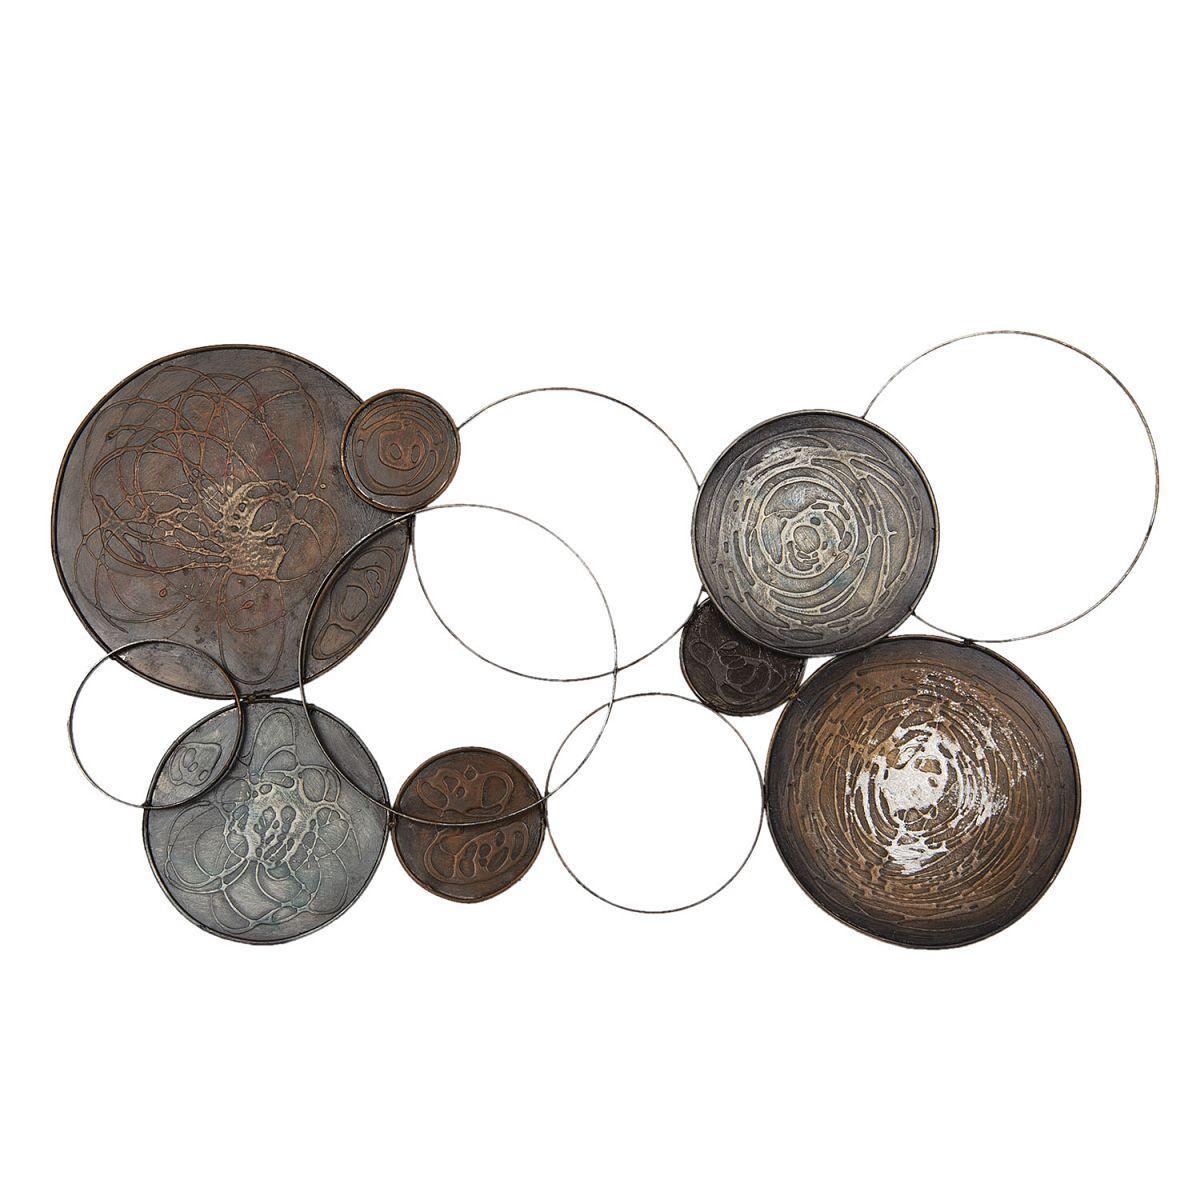 Nástěnná dekorace CIRCLE